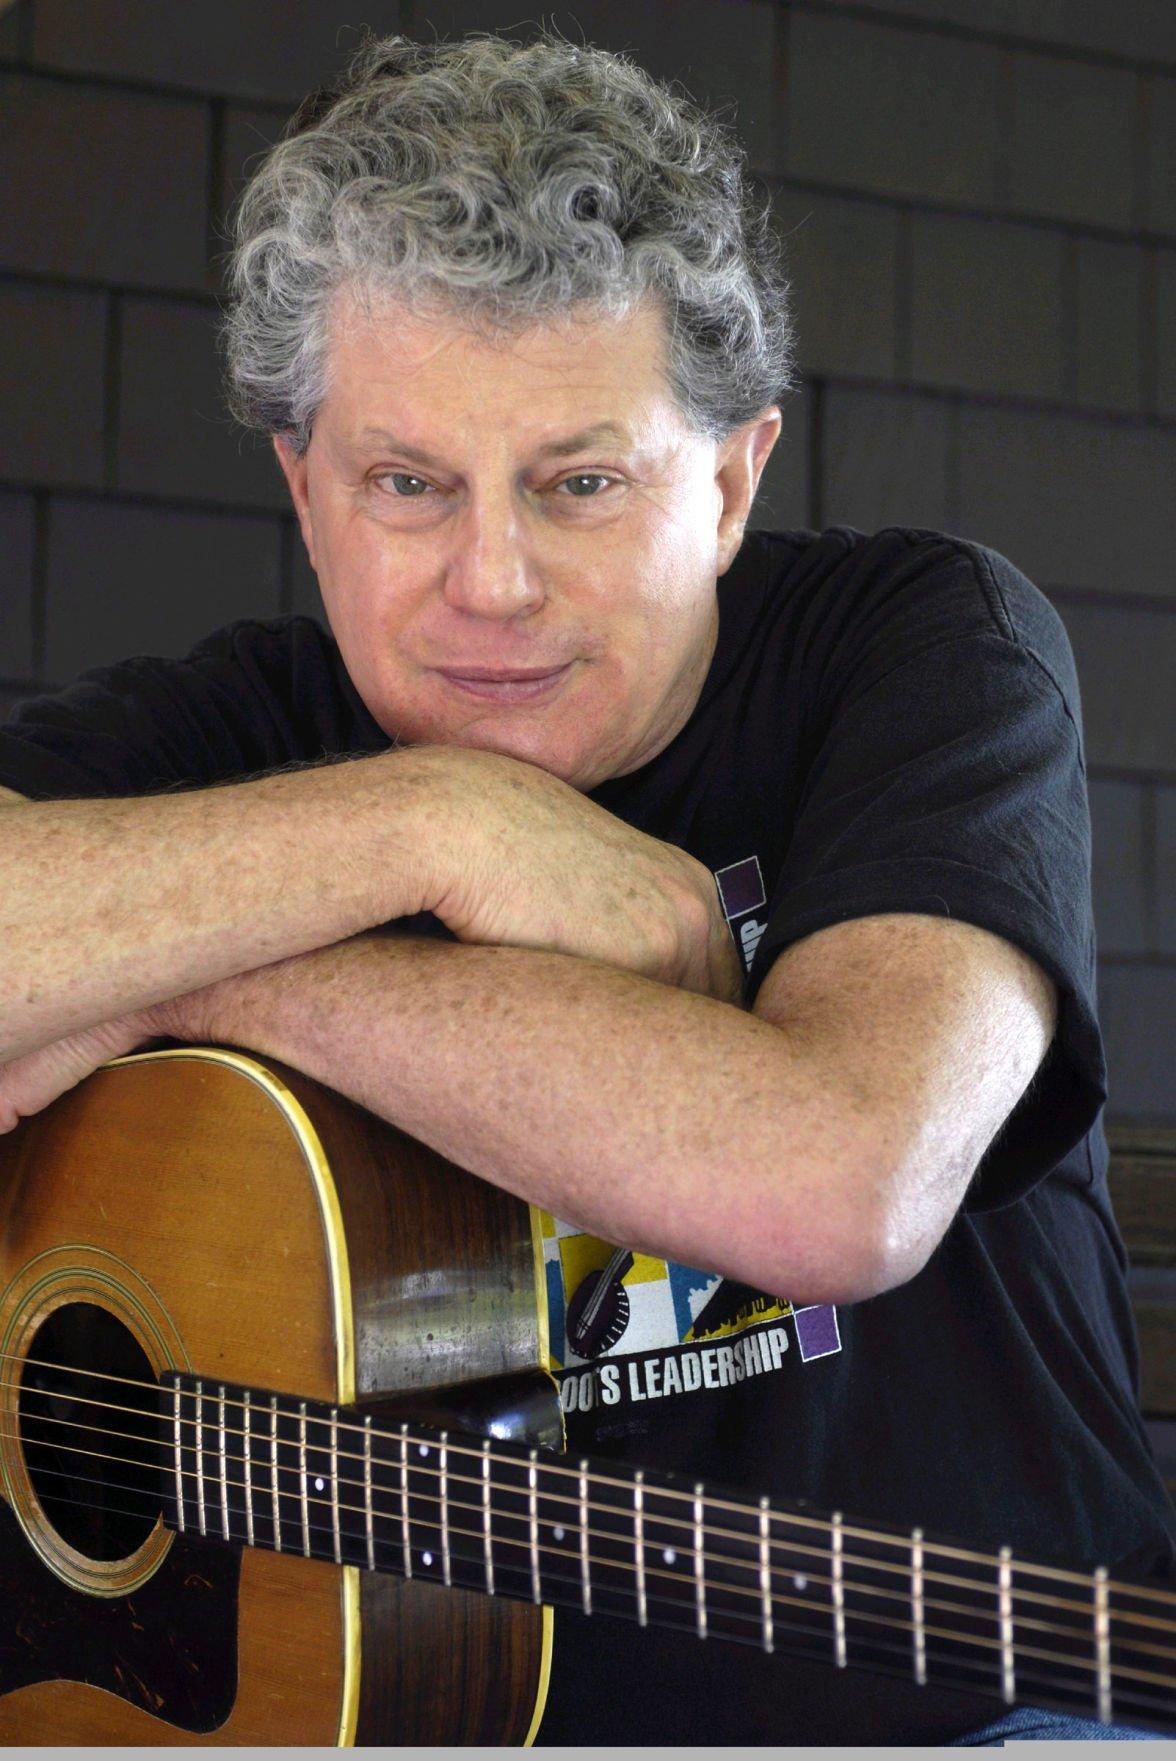 Concert, project showcase unrecorded works of Charlotte folk singer